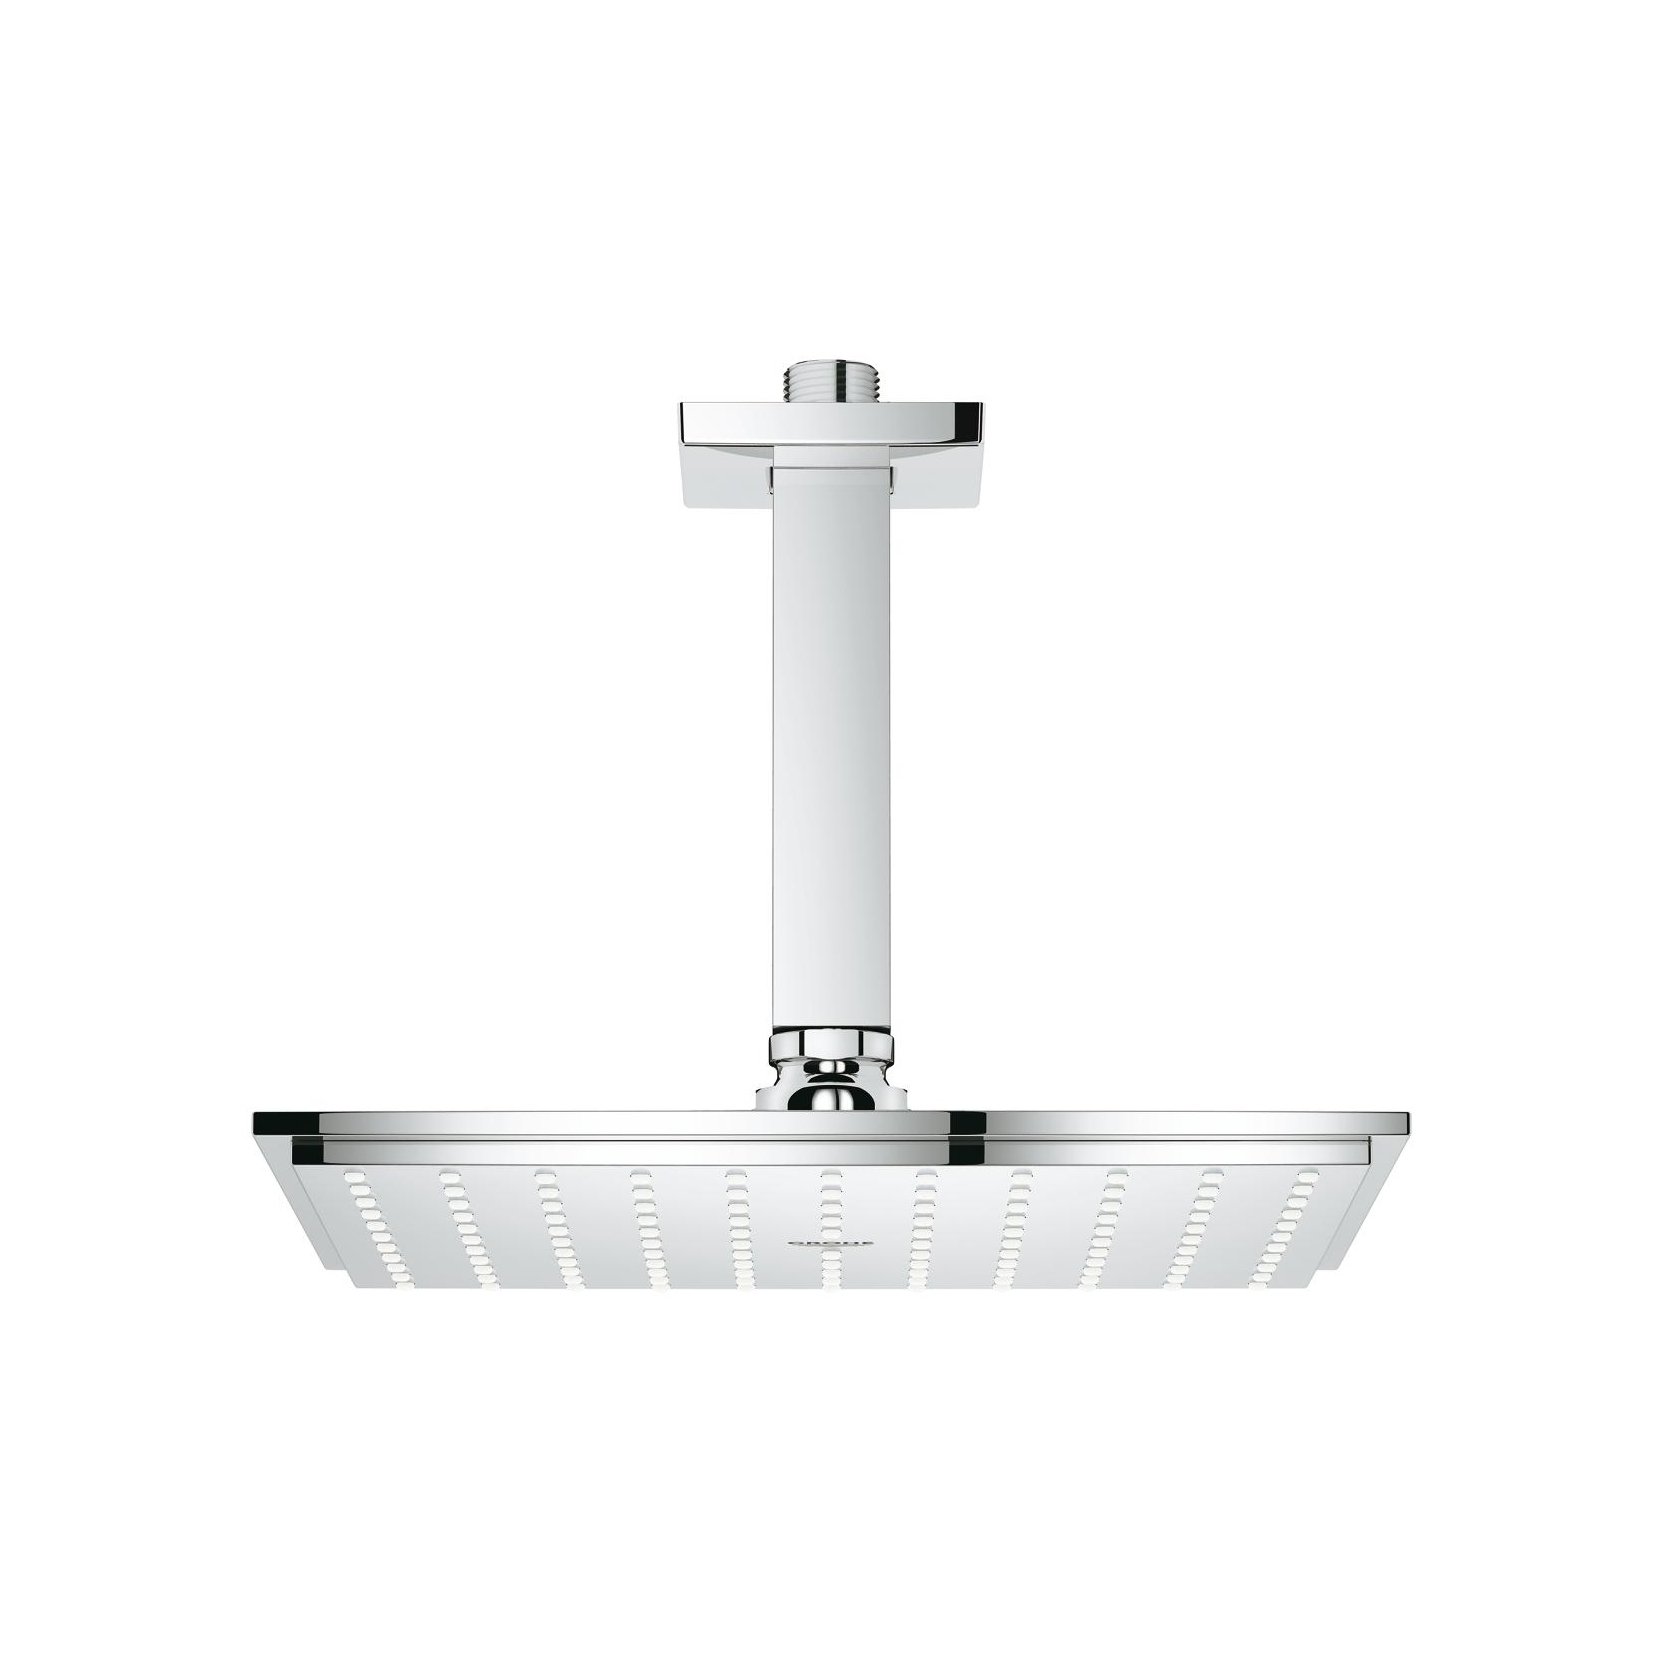 Grohe allure soffione doccia rainshower 230 a soffitto tattahome - Soffione doccia soffitto ...